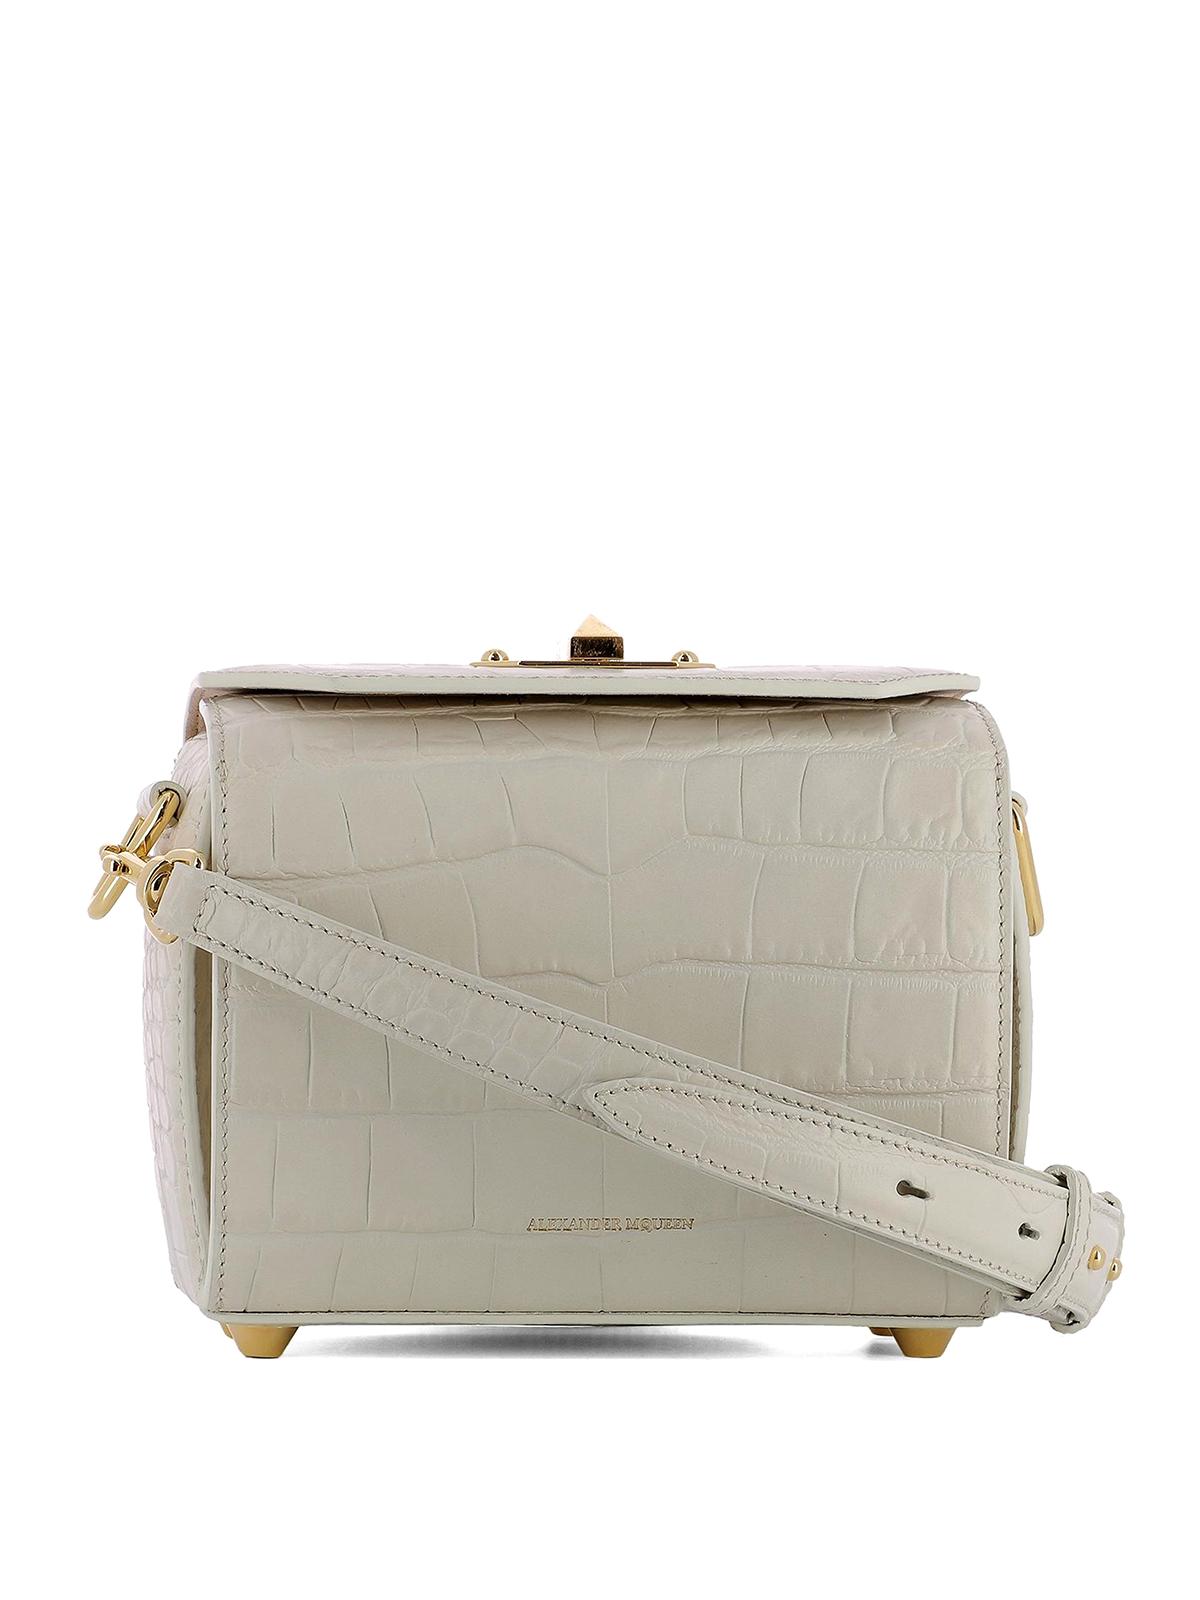 Alexander McQueen Box Bag 19 croco print bag 0xUjC4g